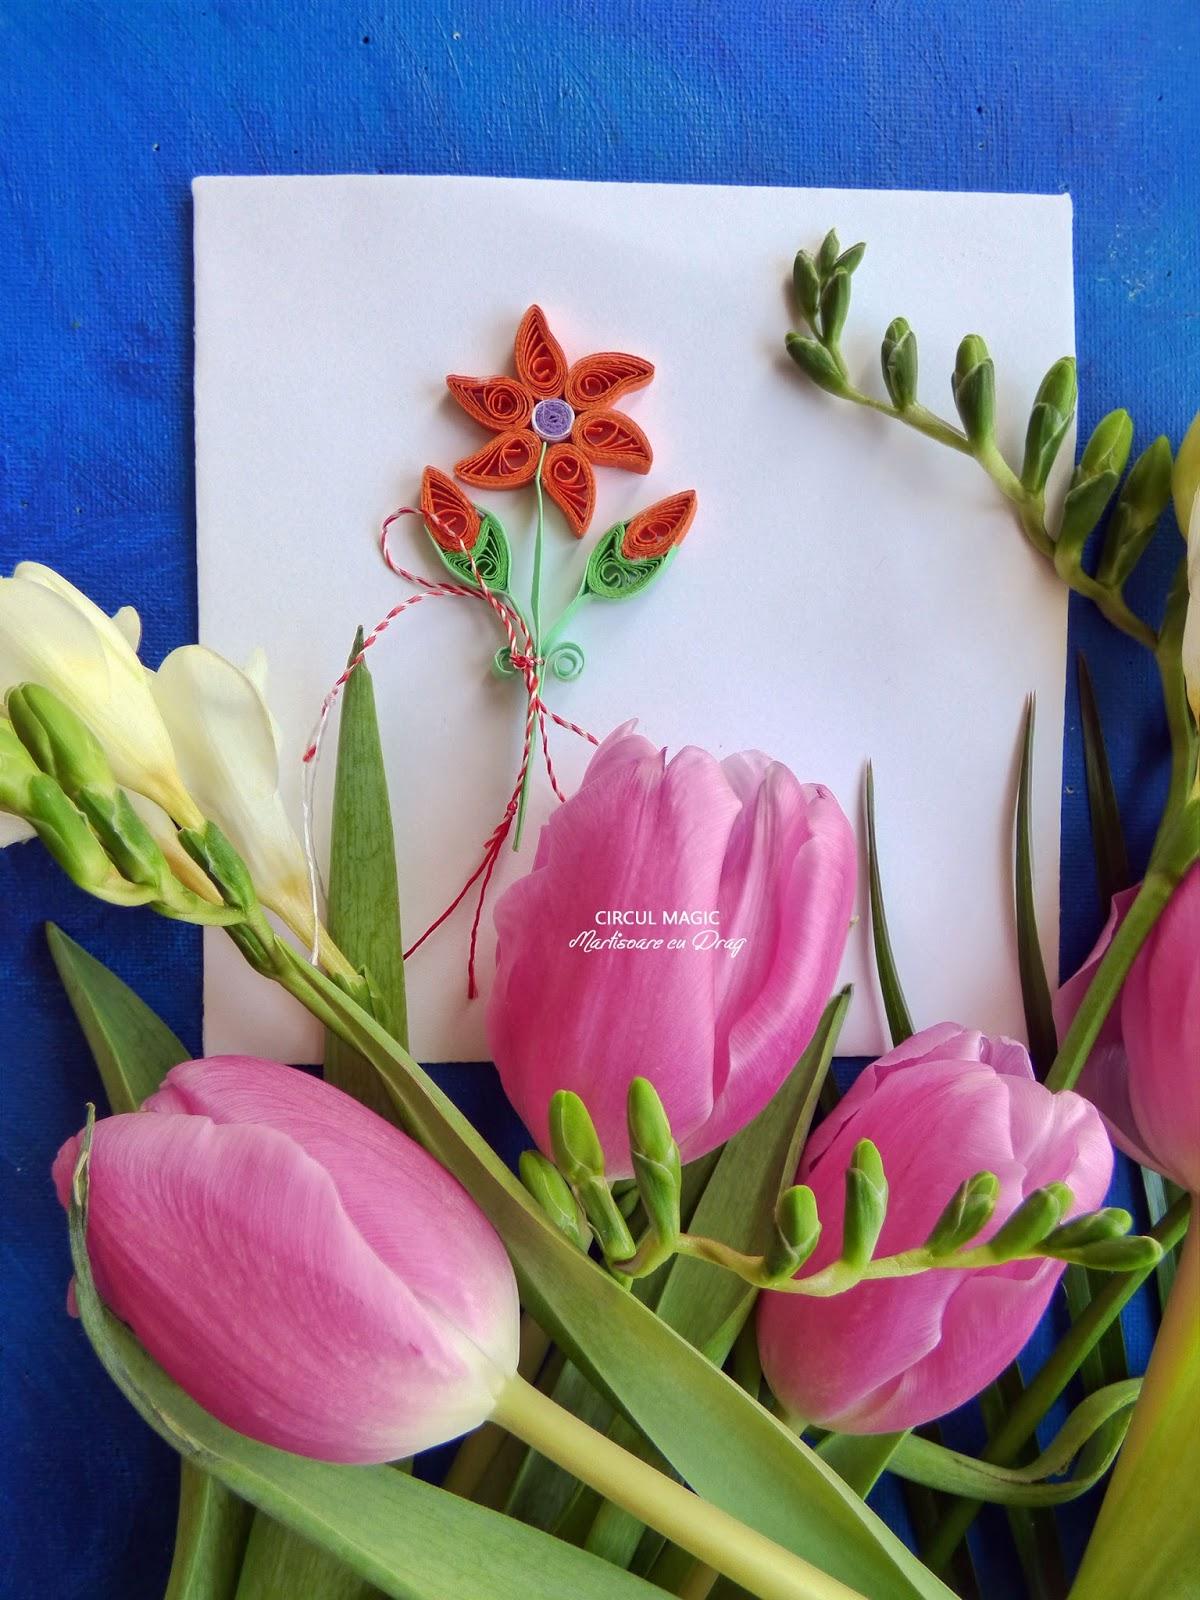 Martisoare Quilling 2017 Flori de Gradina Handmade Circul Magic